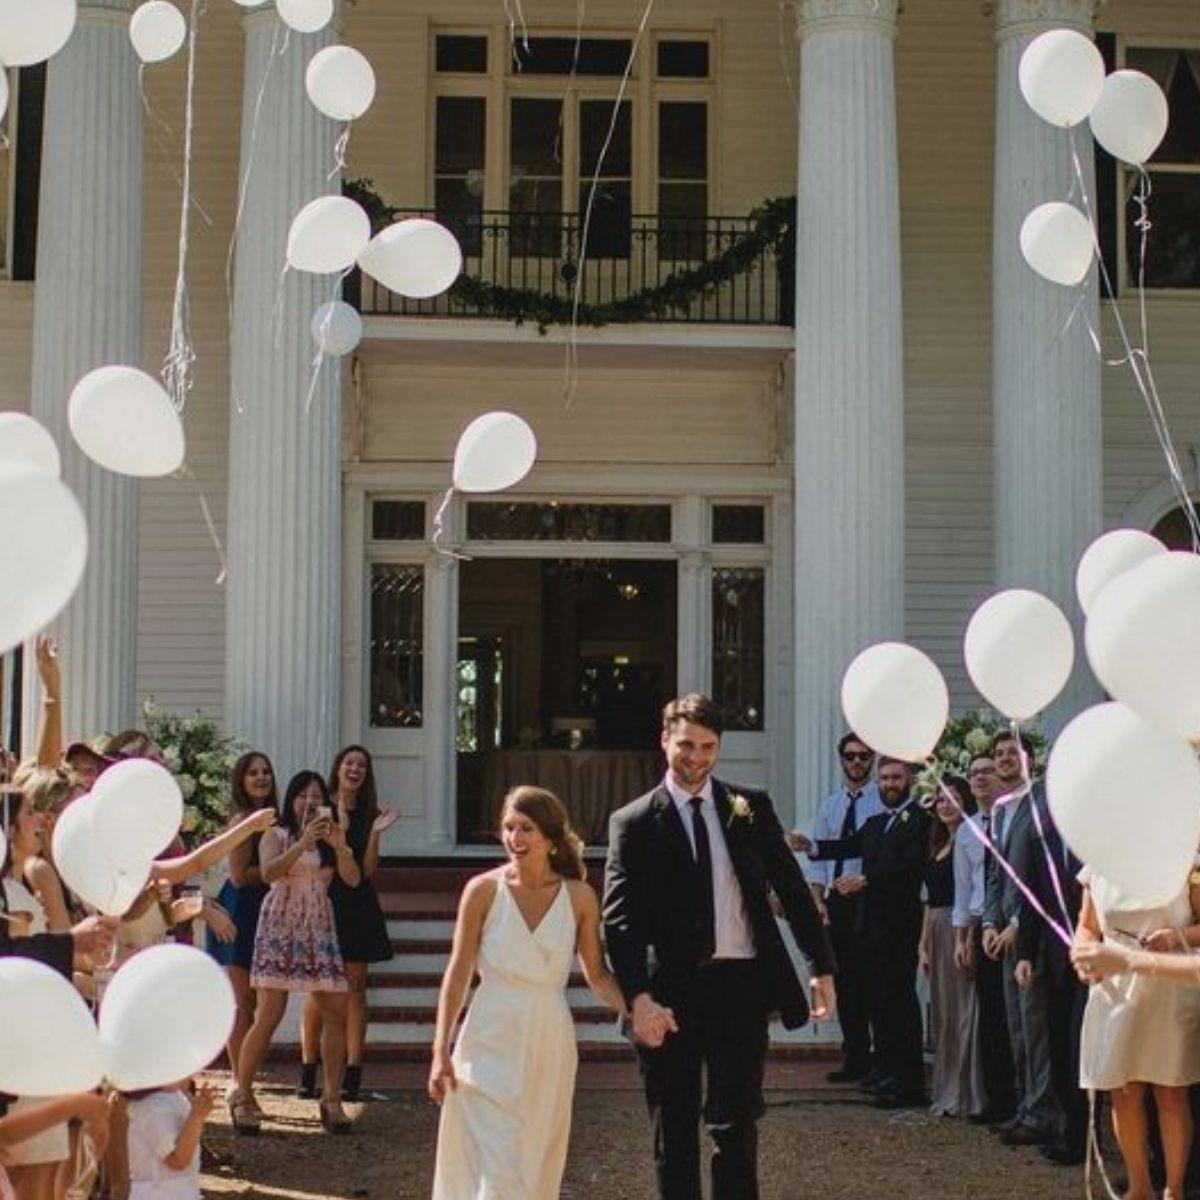 Creative and Fun Wedding Exit Send-off: balloons